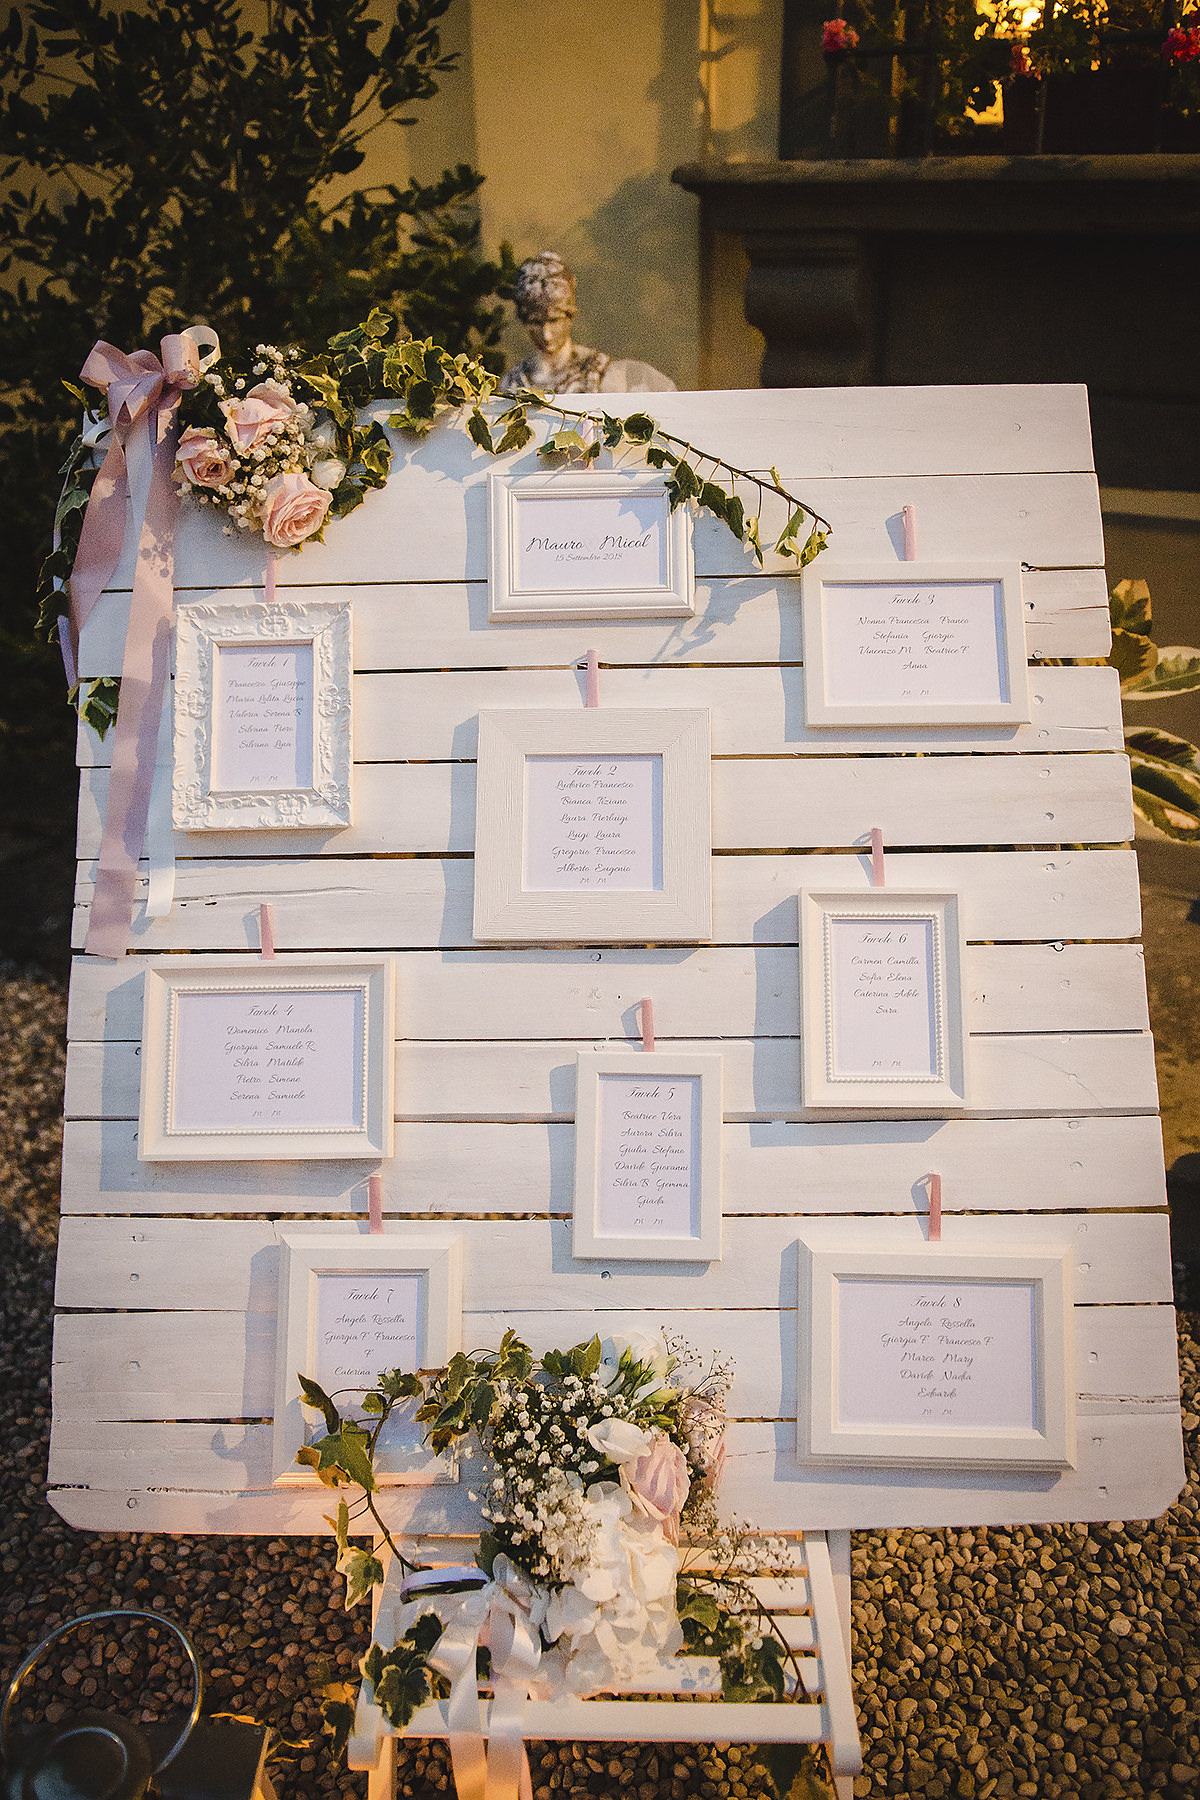 Tableau de mariage e segnatavoli con cornici